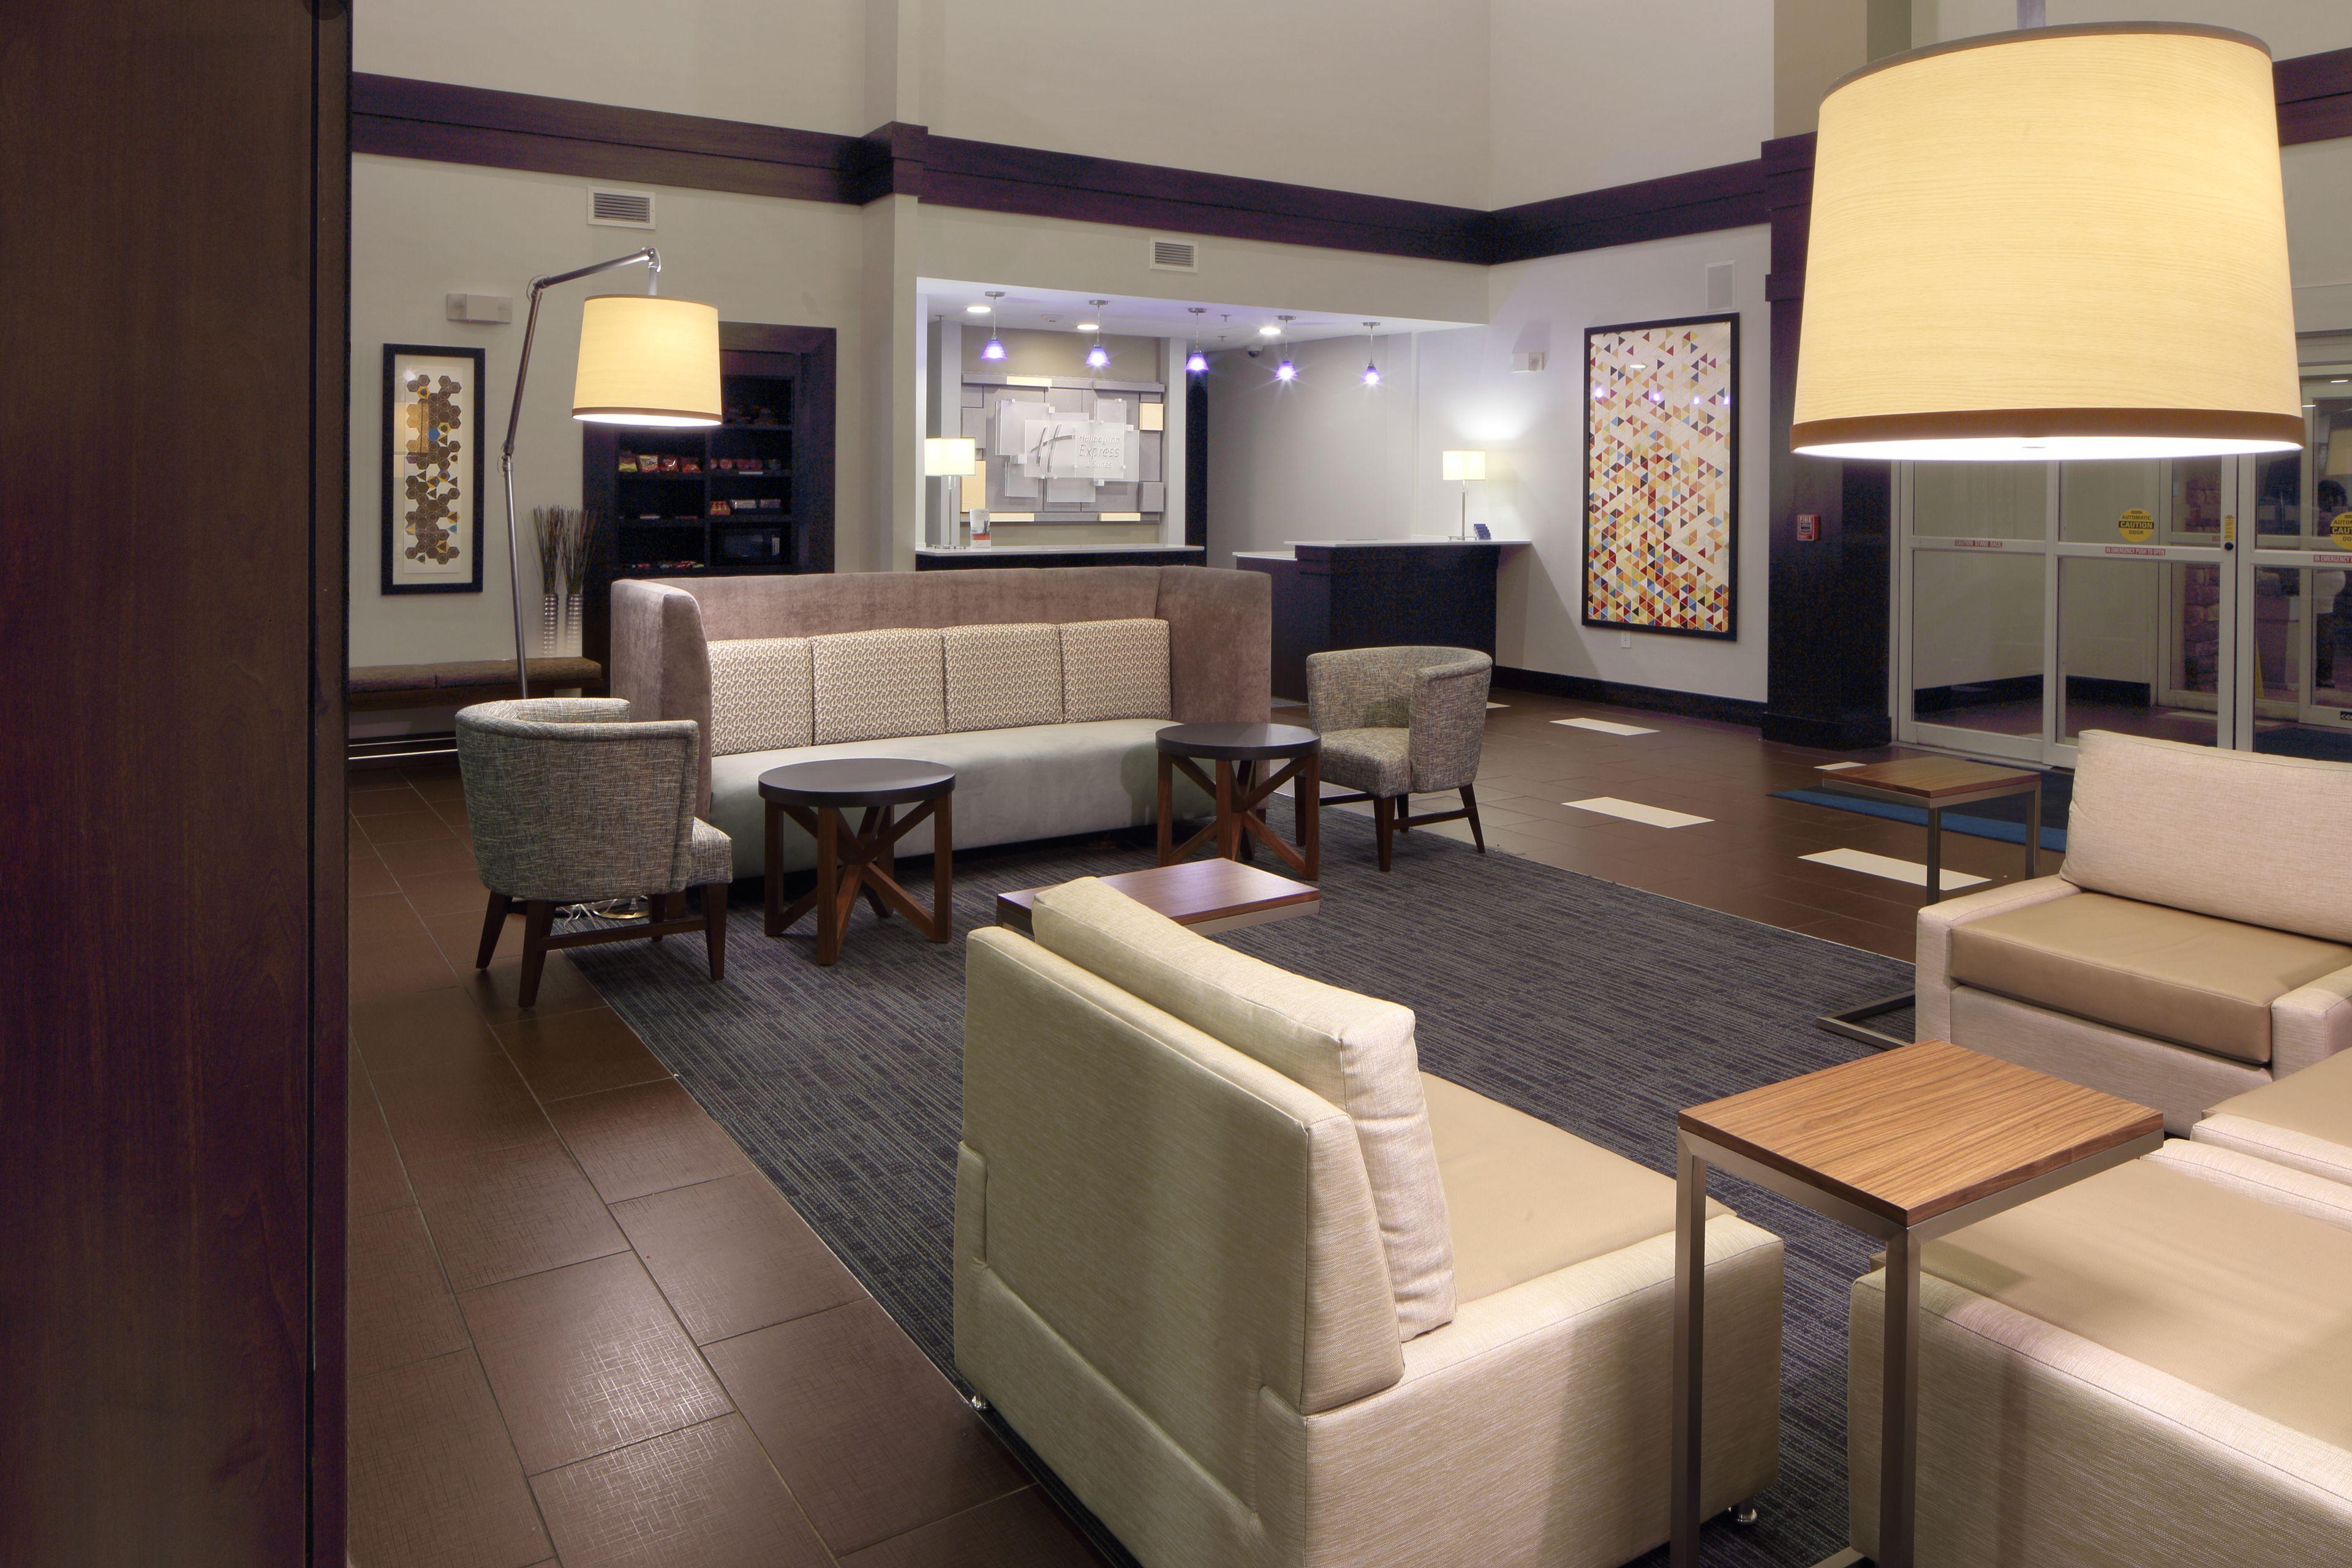 Holiday Inn Express & Suites Atlanta Arpt West - Camp Creek image 5